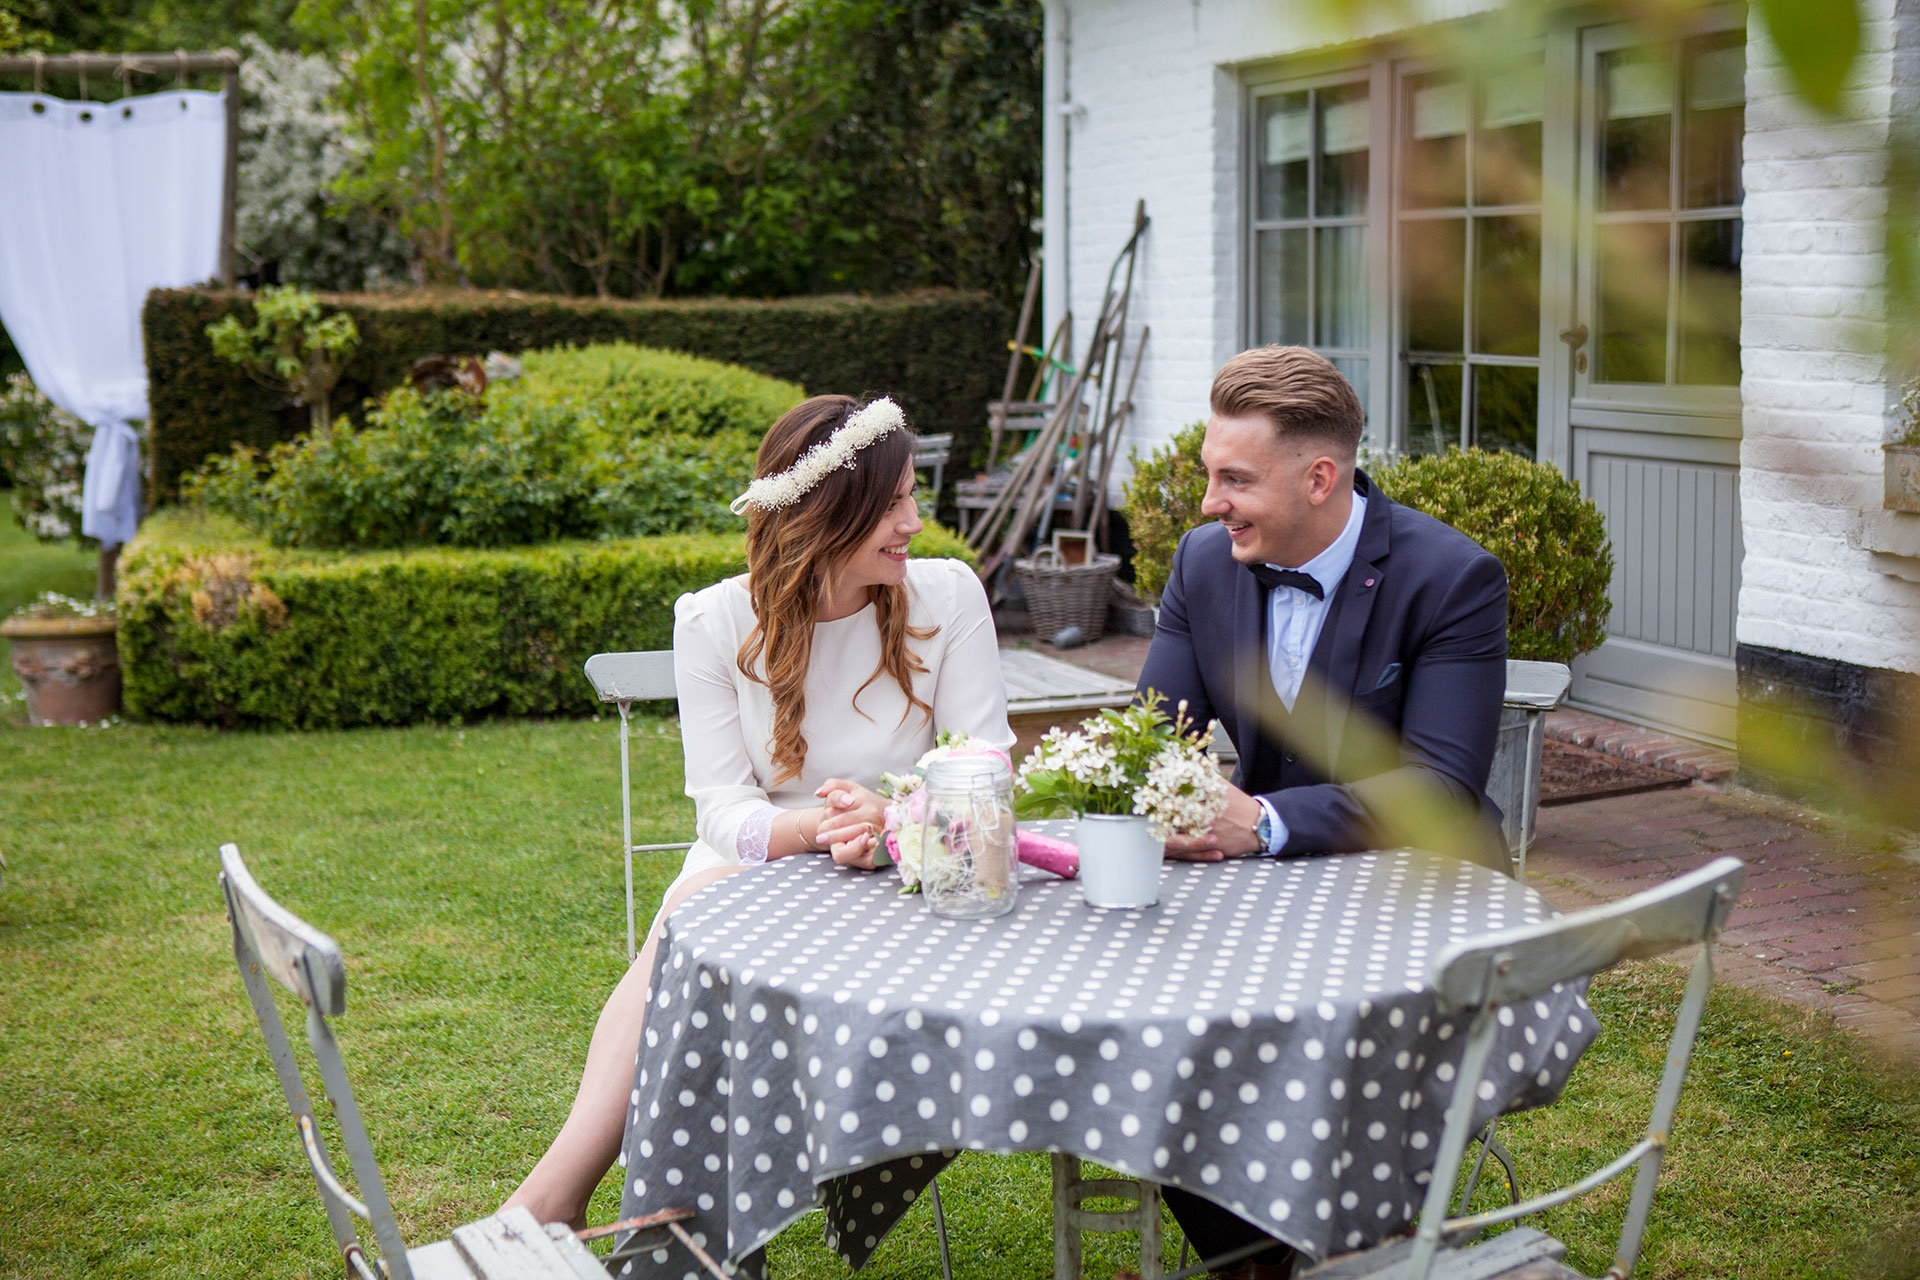 particuliers-evenements-mariages-oui-zelie&valentin-29